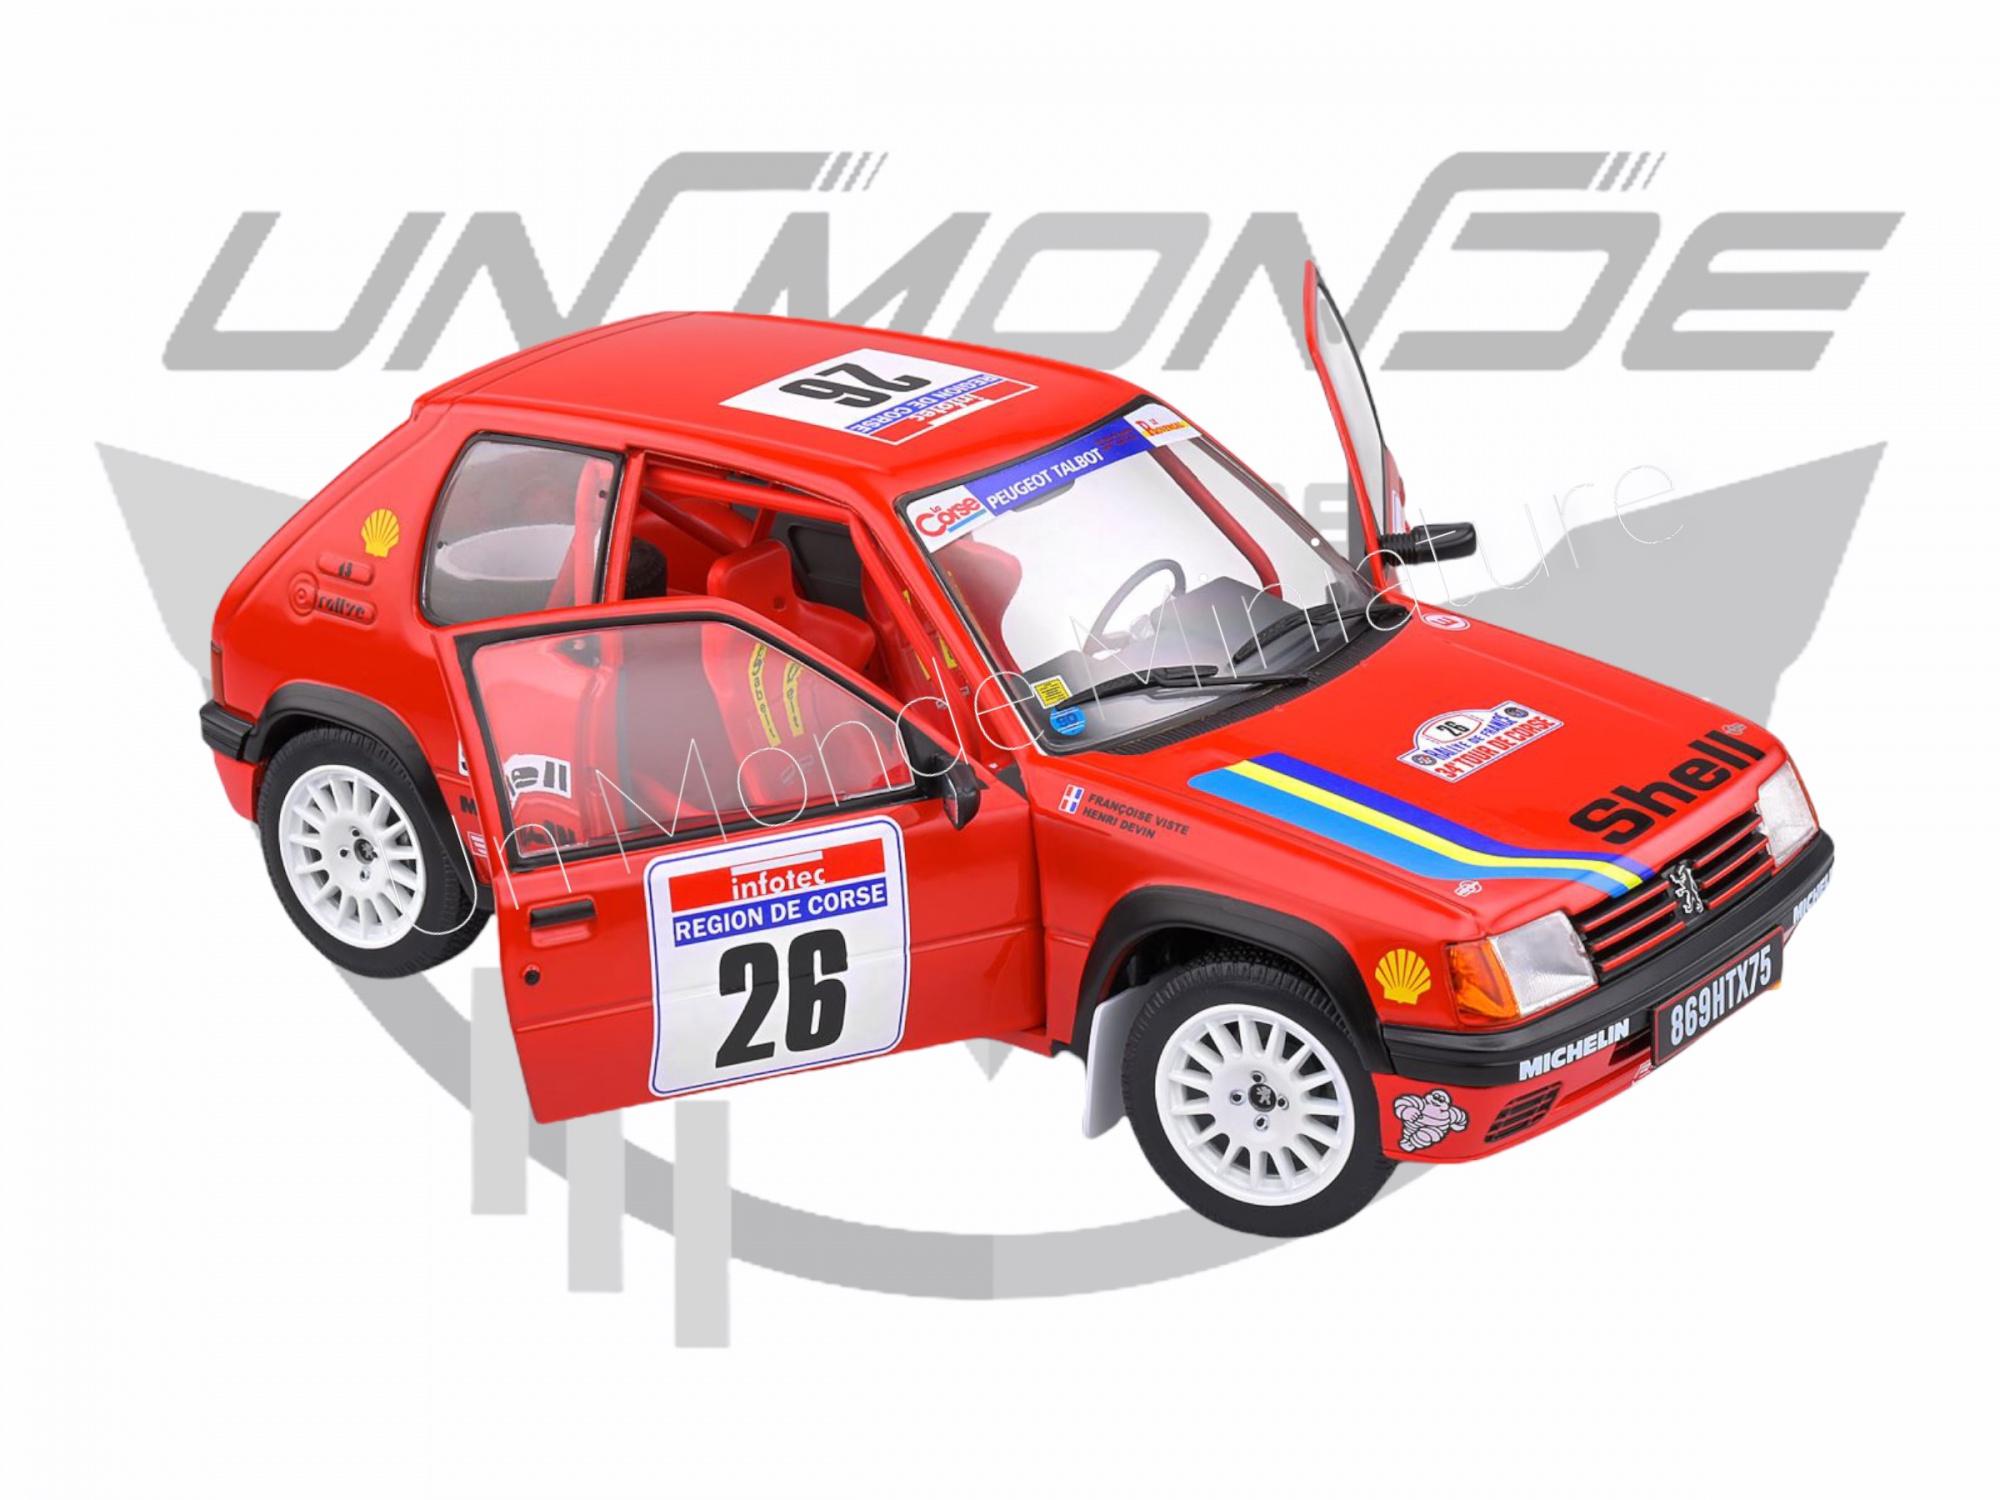 Peugeot 205 Rallye Tour de Corse 1990